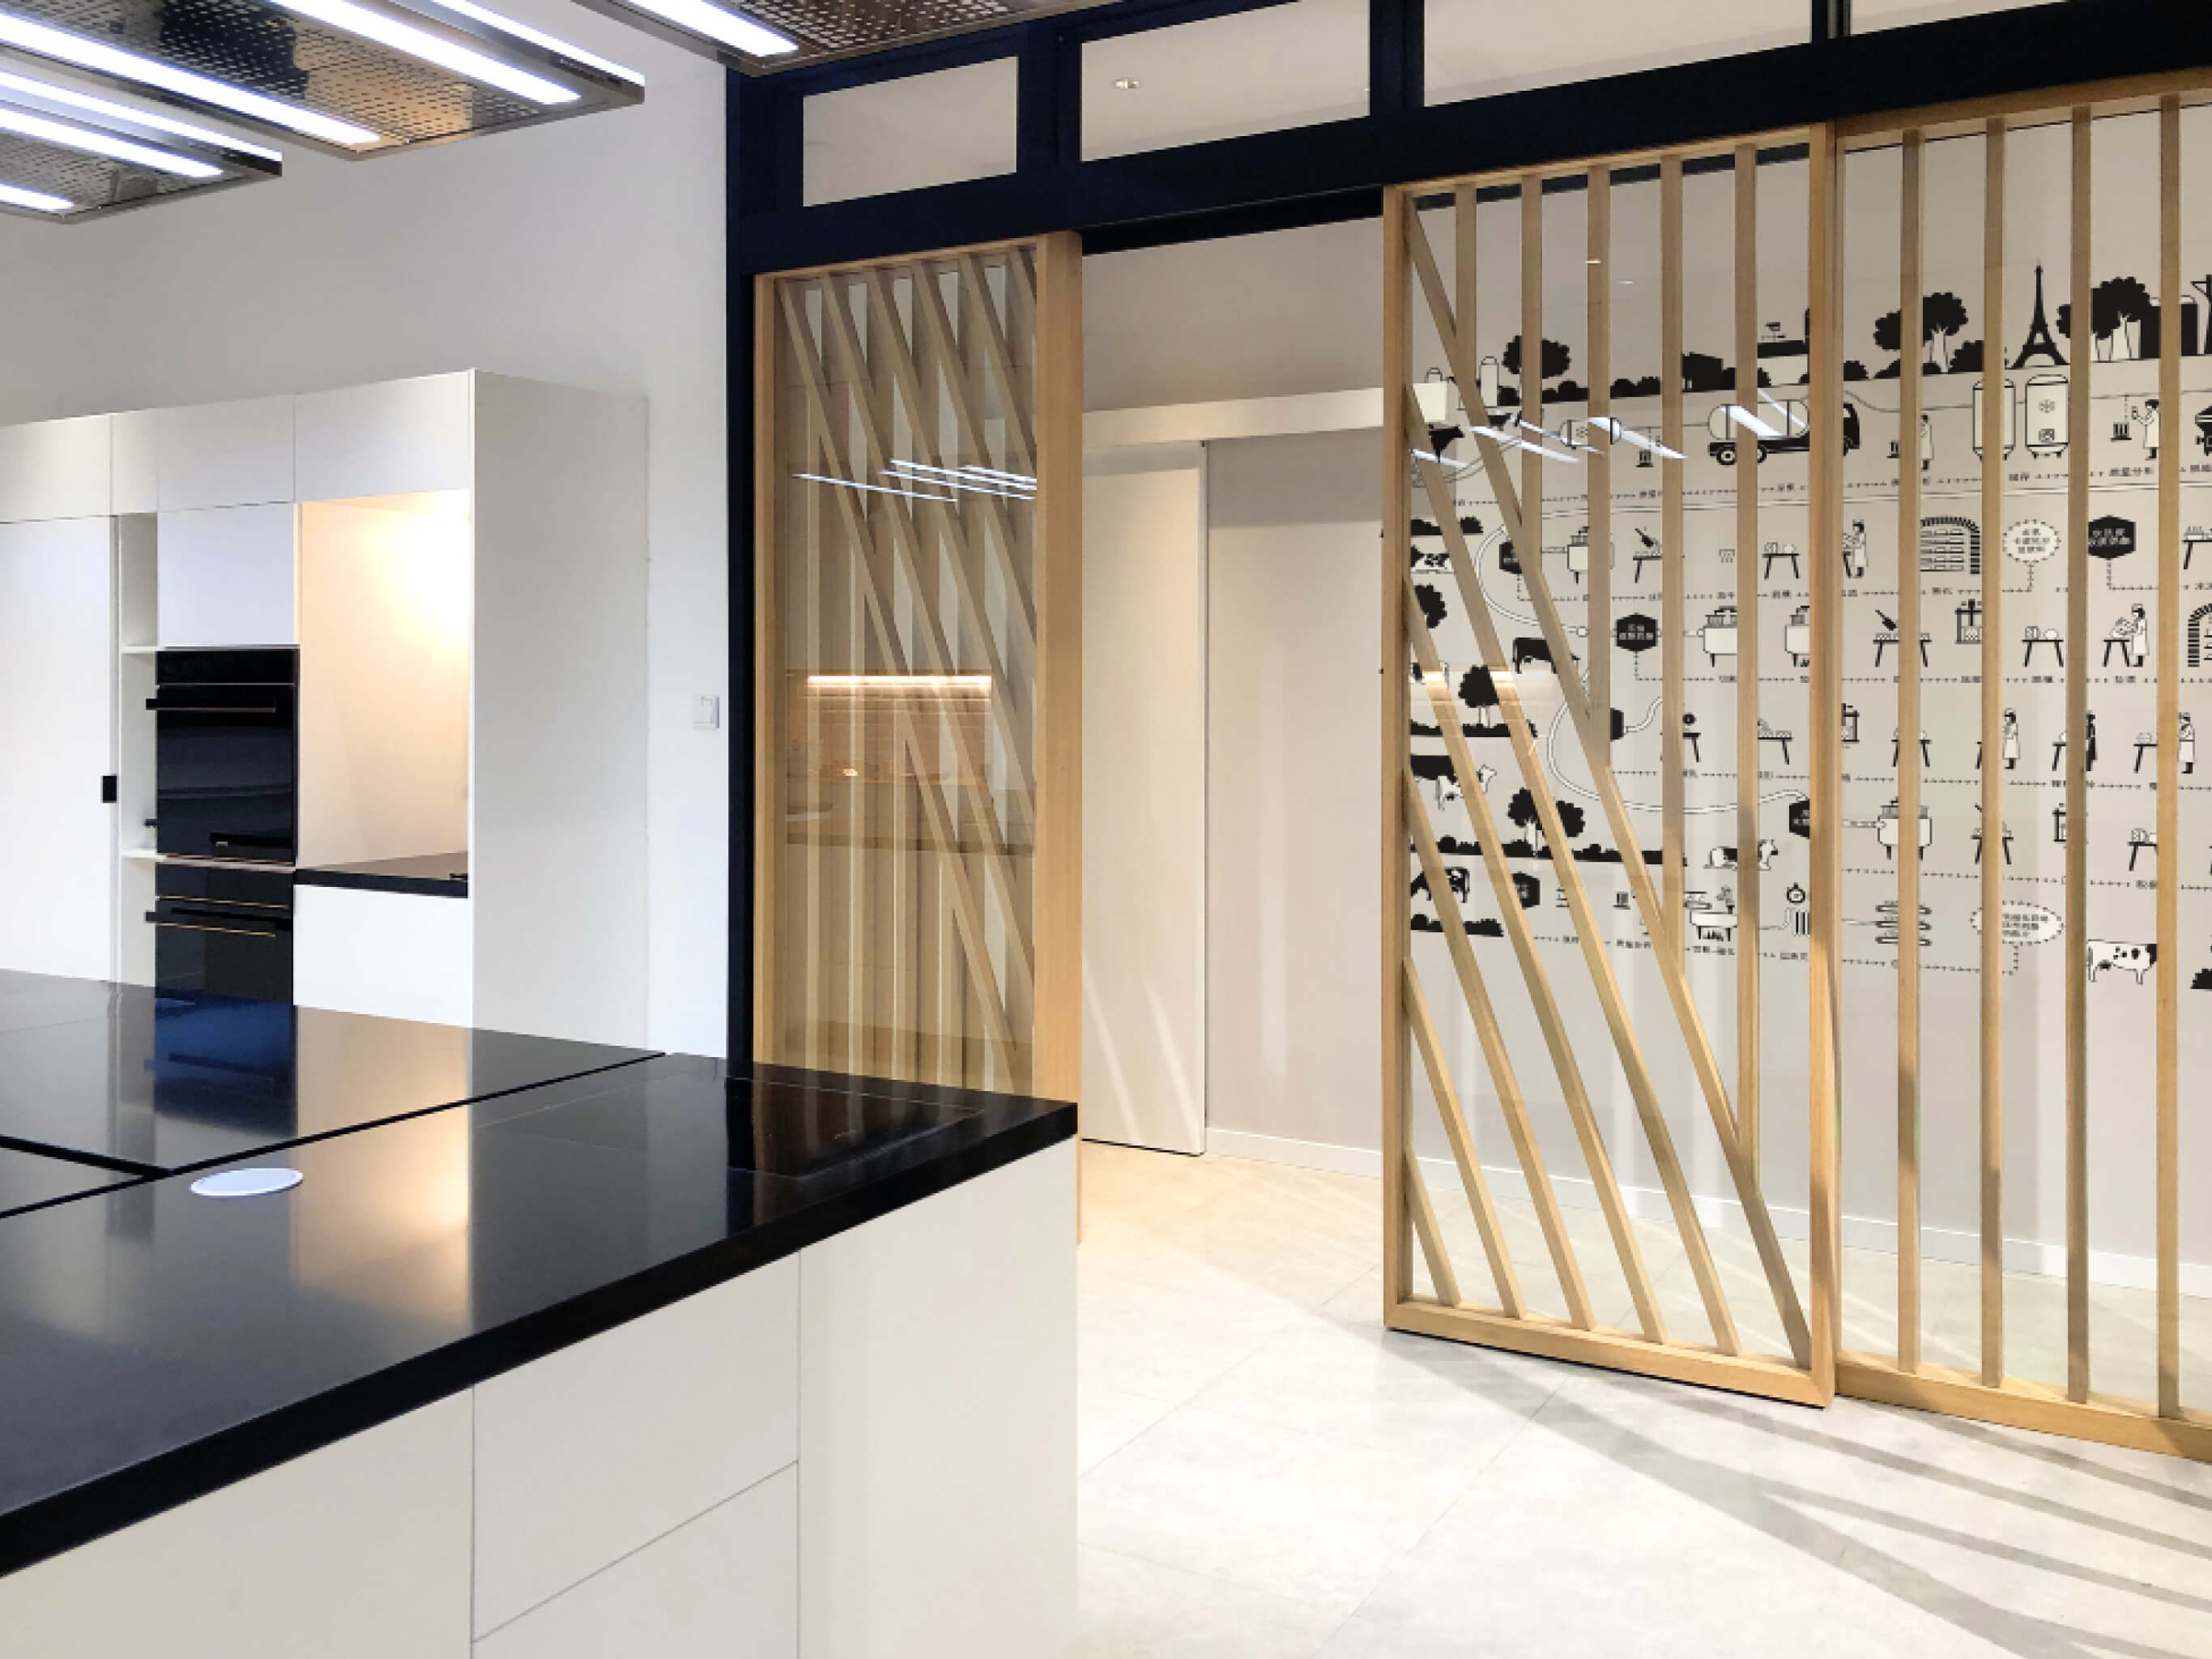 la-cremerie-mobilier-cloison-design-ichetkar2